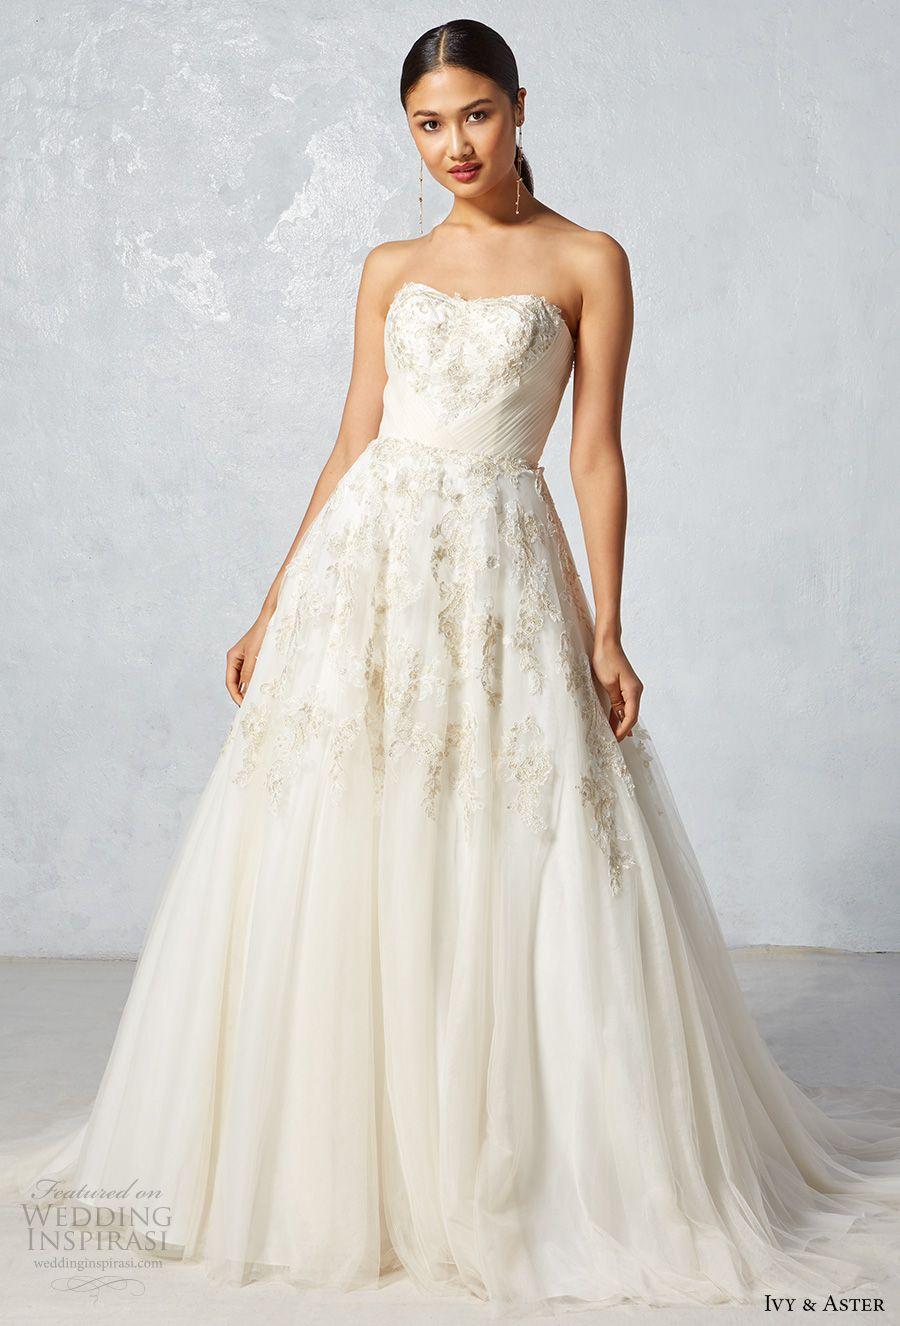 Ivy Aster Fall 2017 Wedding Dresses Wedding Inspirasi Ball Gowns Wedding Gold Lace Wedding Dress Ball Gown Wedding Dress [ 1326 x 900 Pixel ]